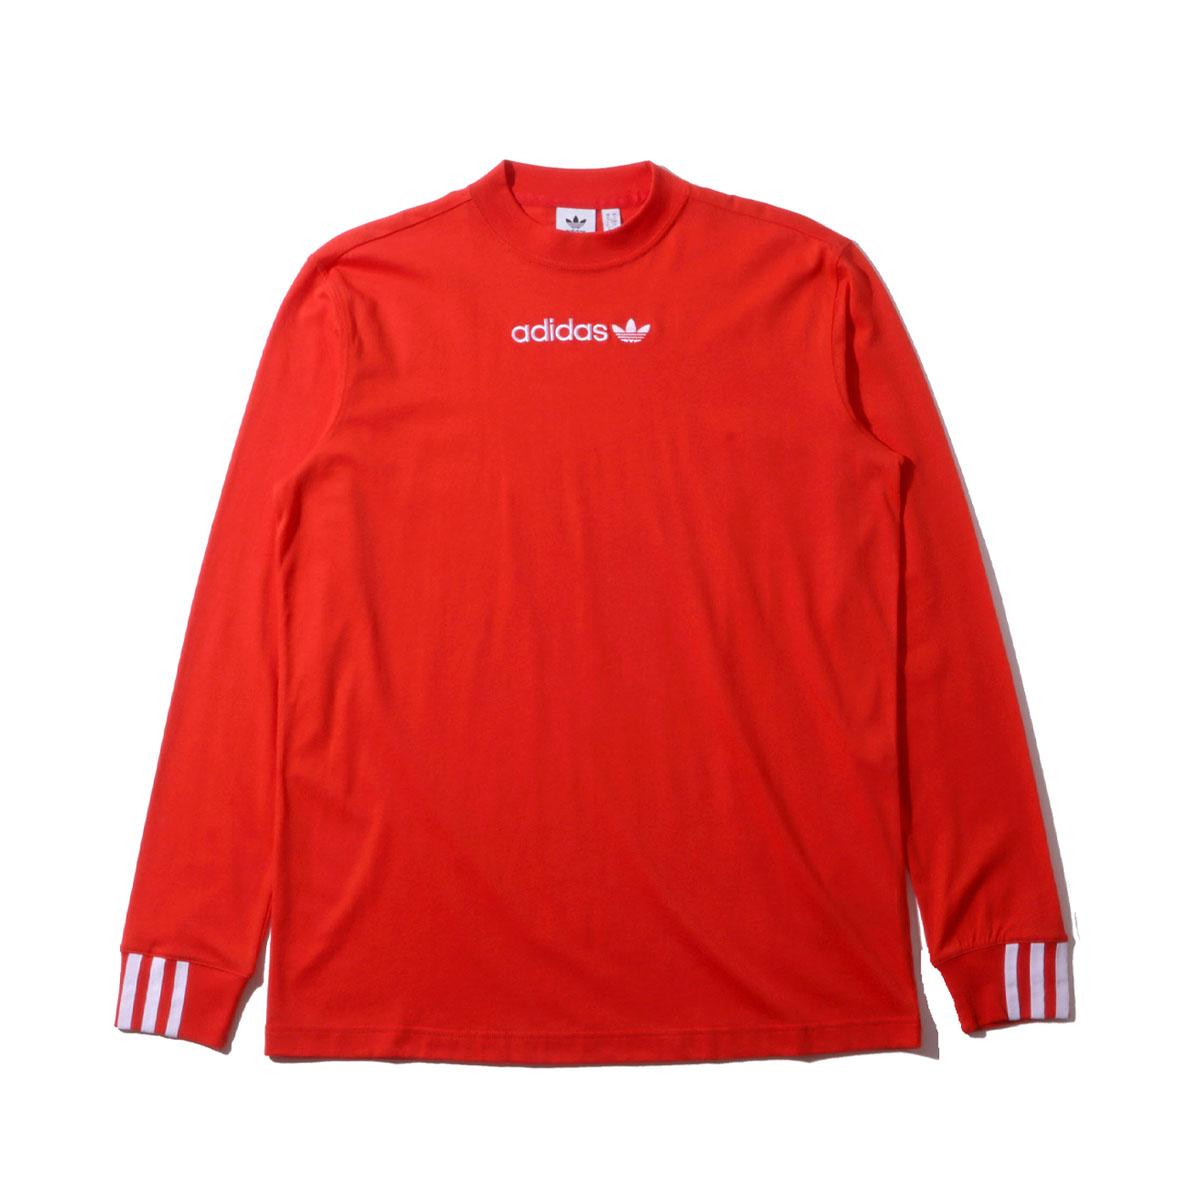 1a7ac5ee22 adidas Originals COEEZE LS TEE (ACTIVE RED) (Adidas originals COEEZE LS tea)  ...